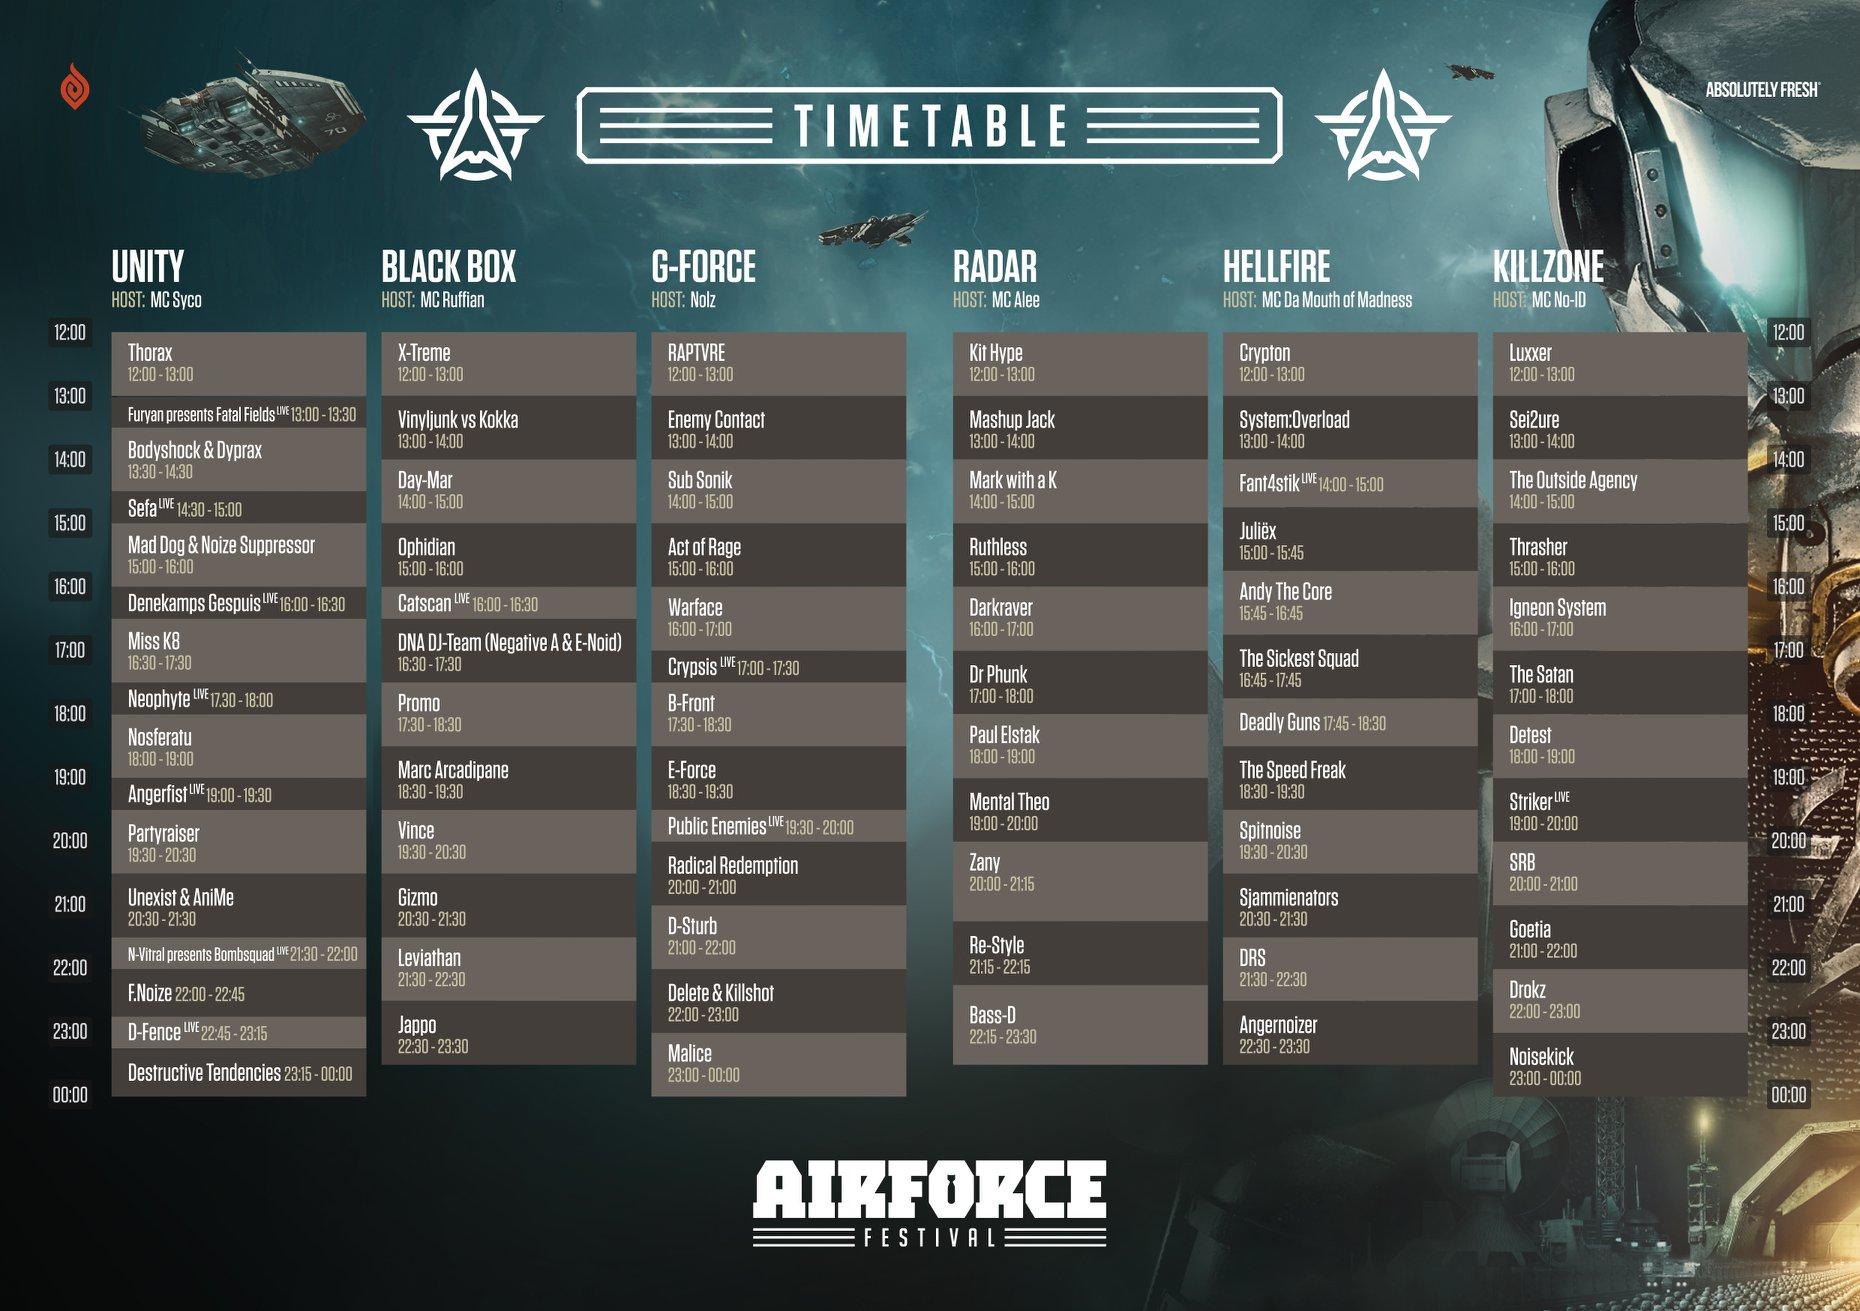 Air Force Festival